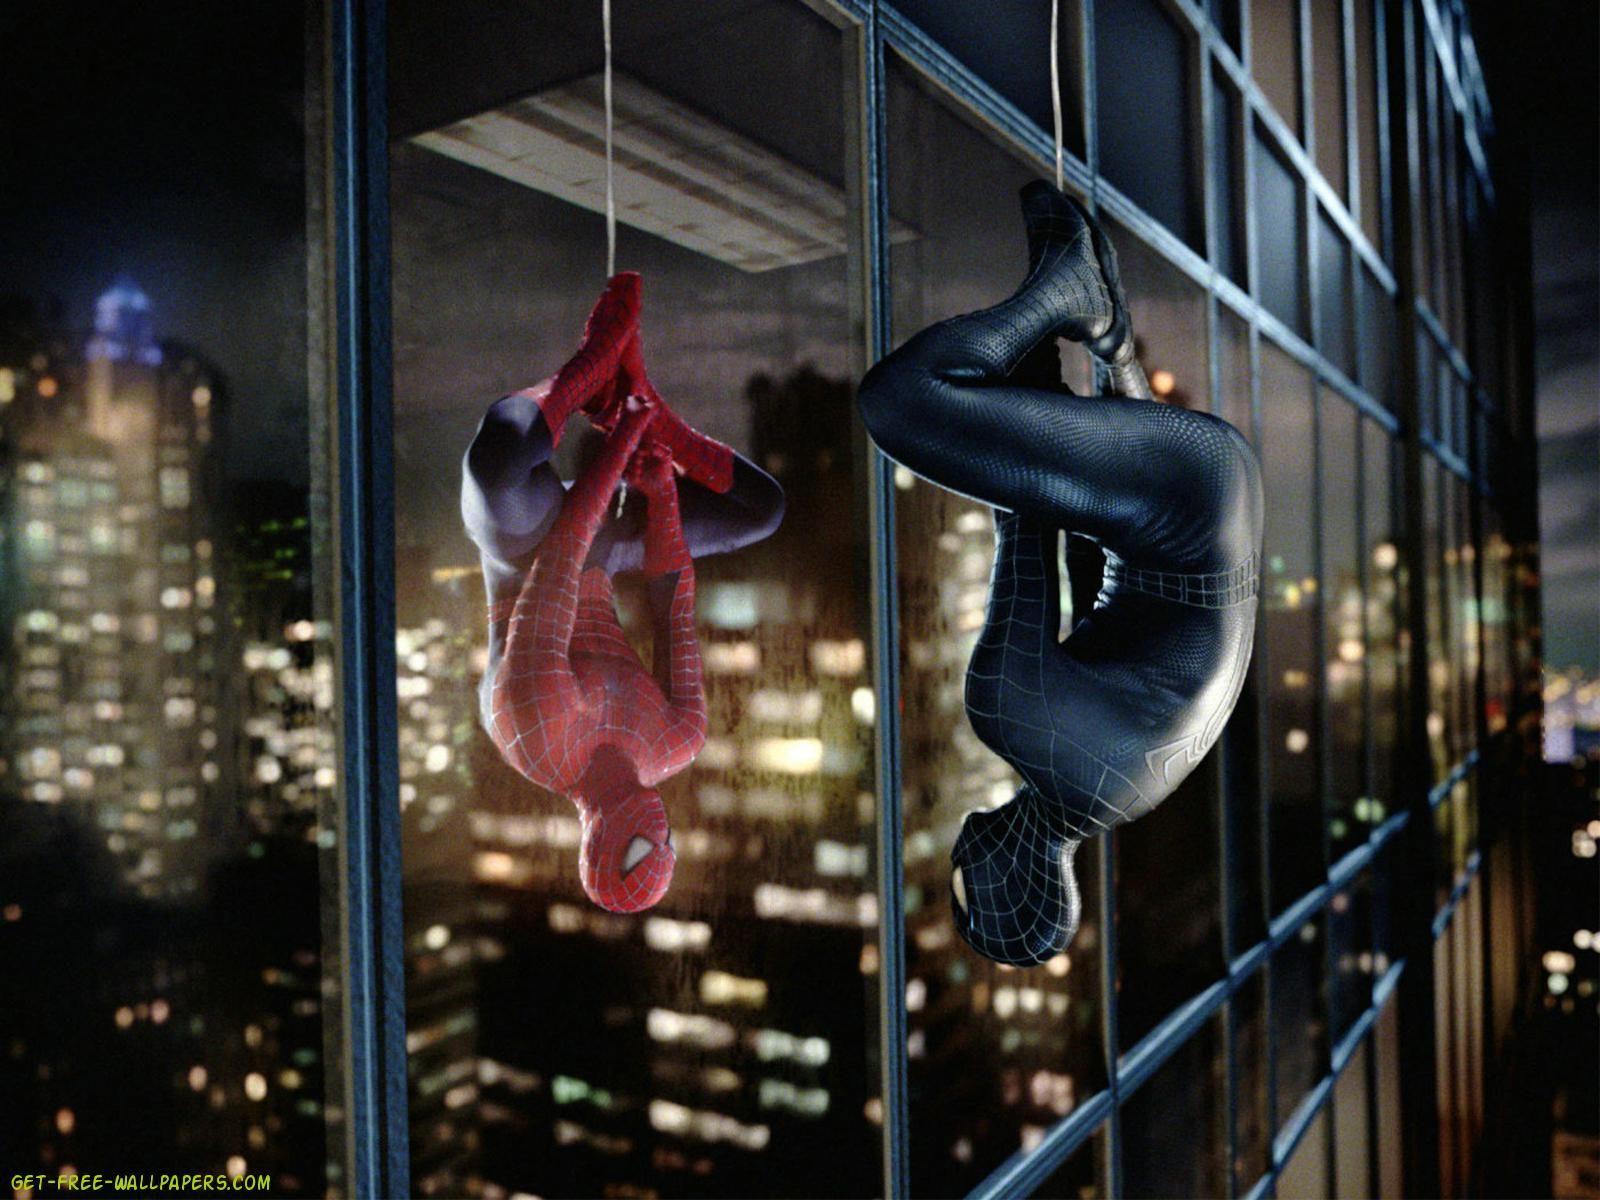 Pin On Sam Raimi Spiderman Trilogy